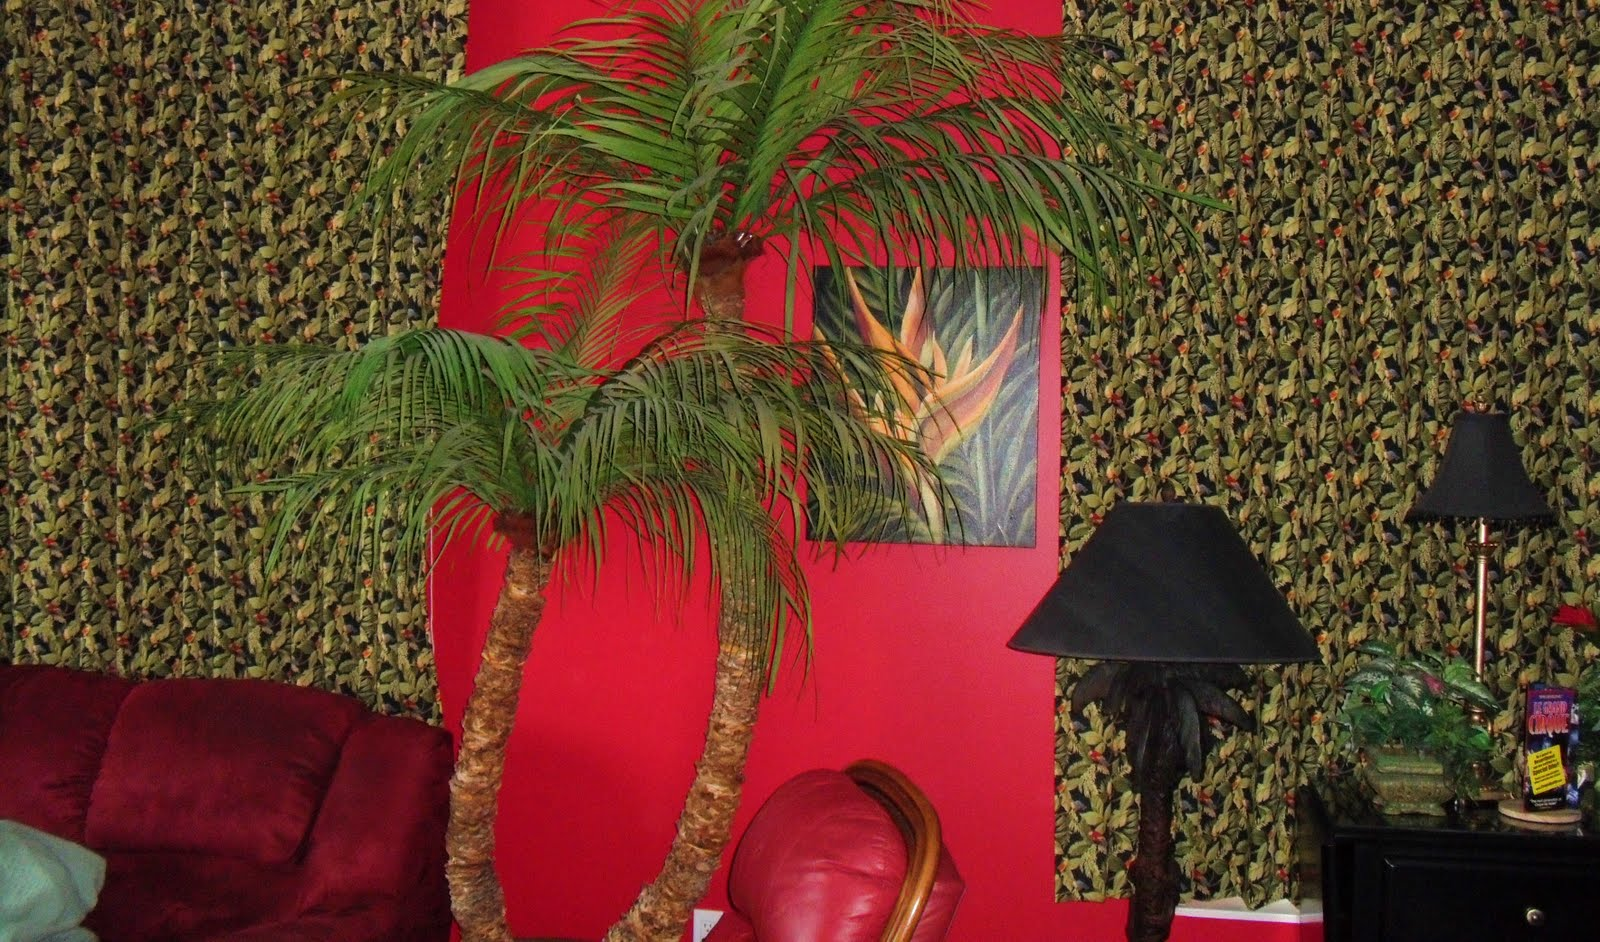 wallpapers wallpapers hd desktop wallpapers online magical hd 1600x942